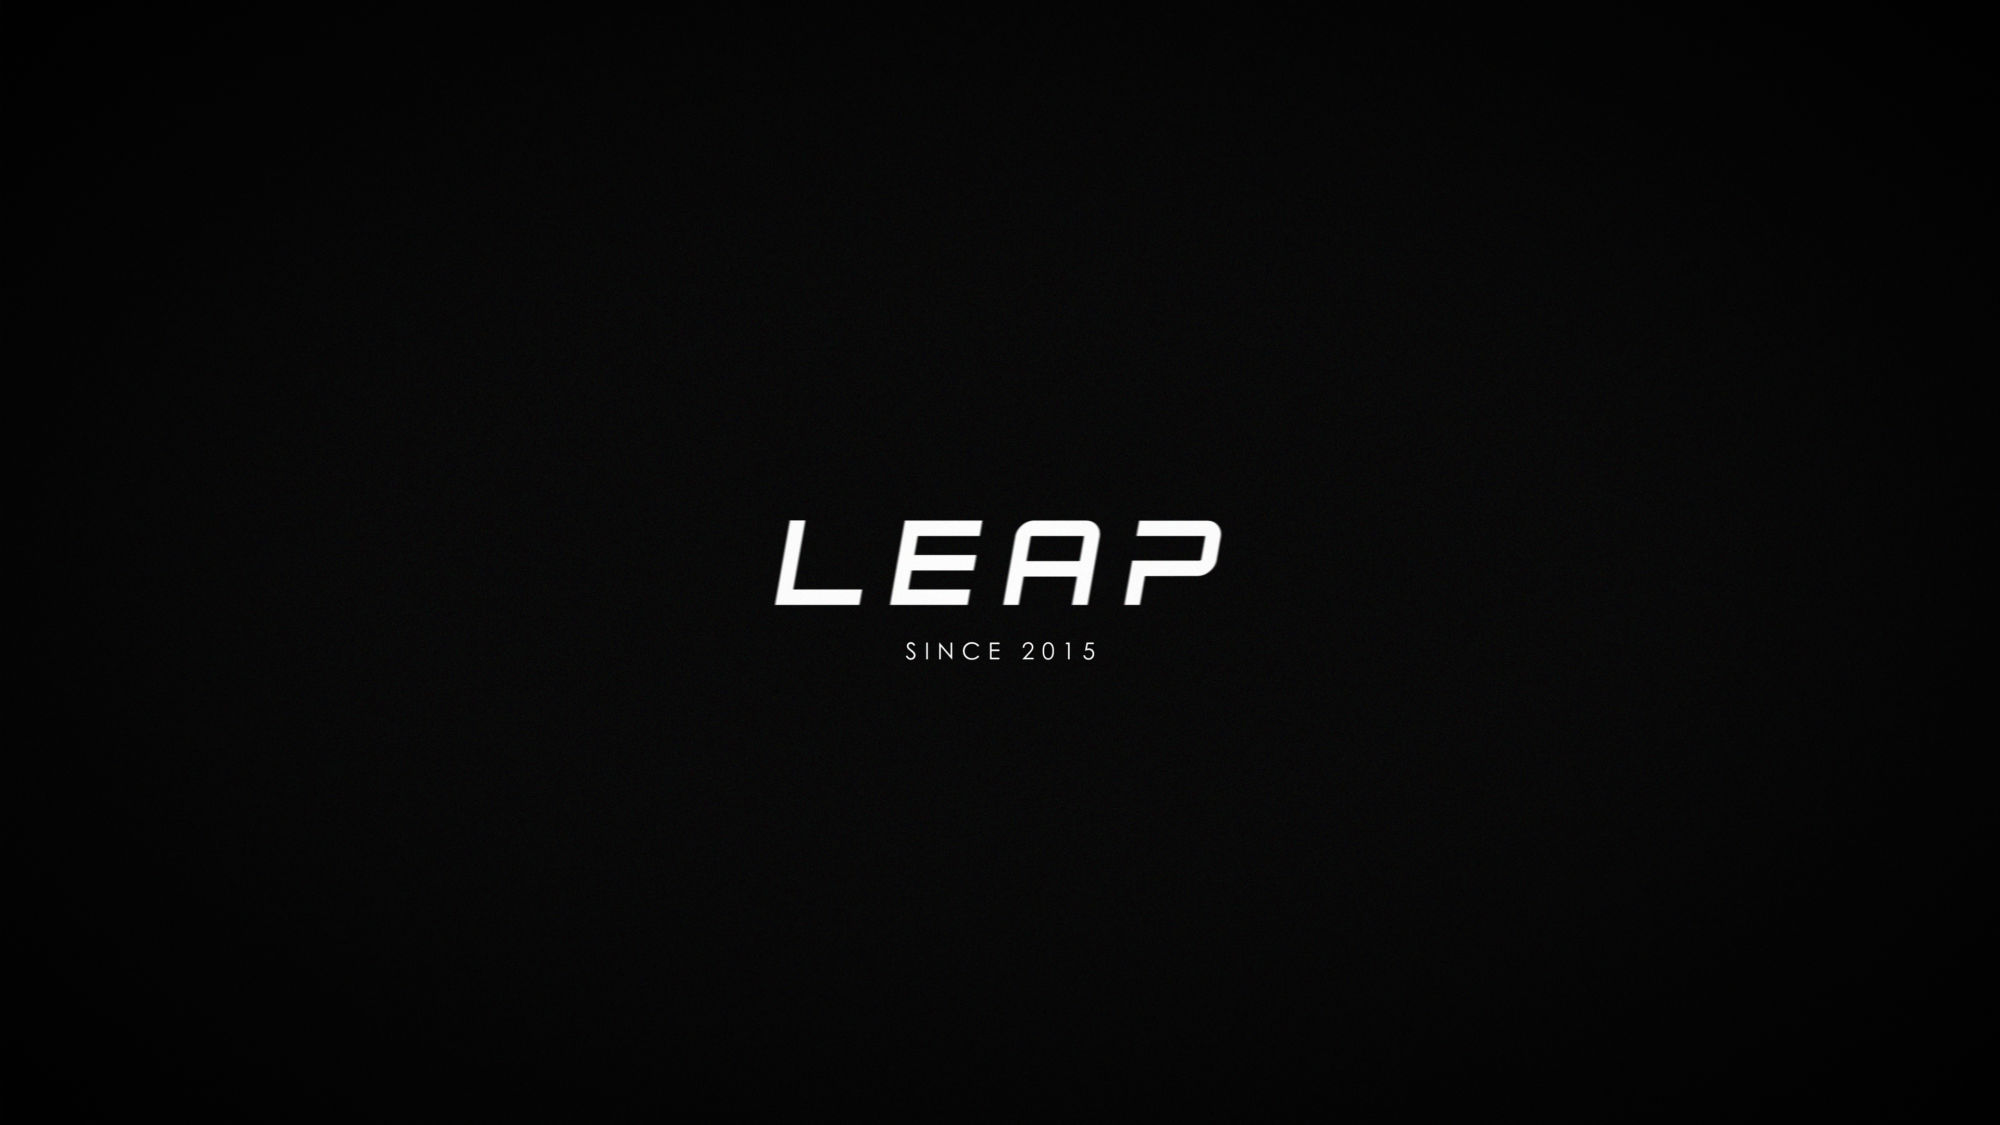 since 2015 leapparkour